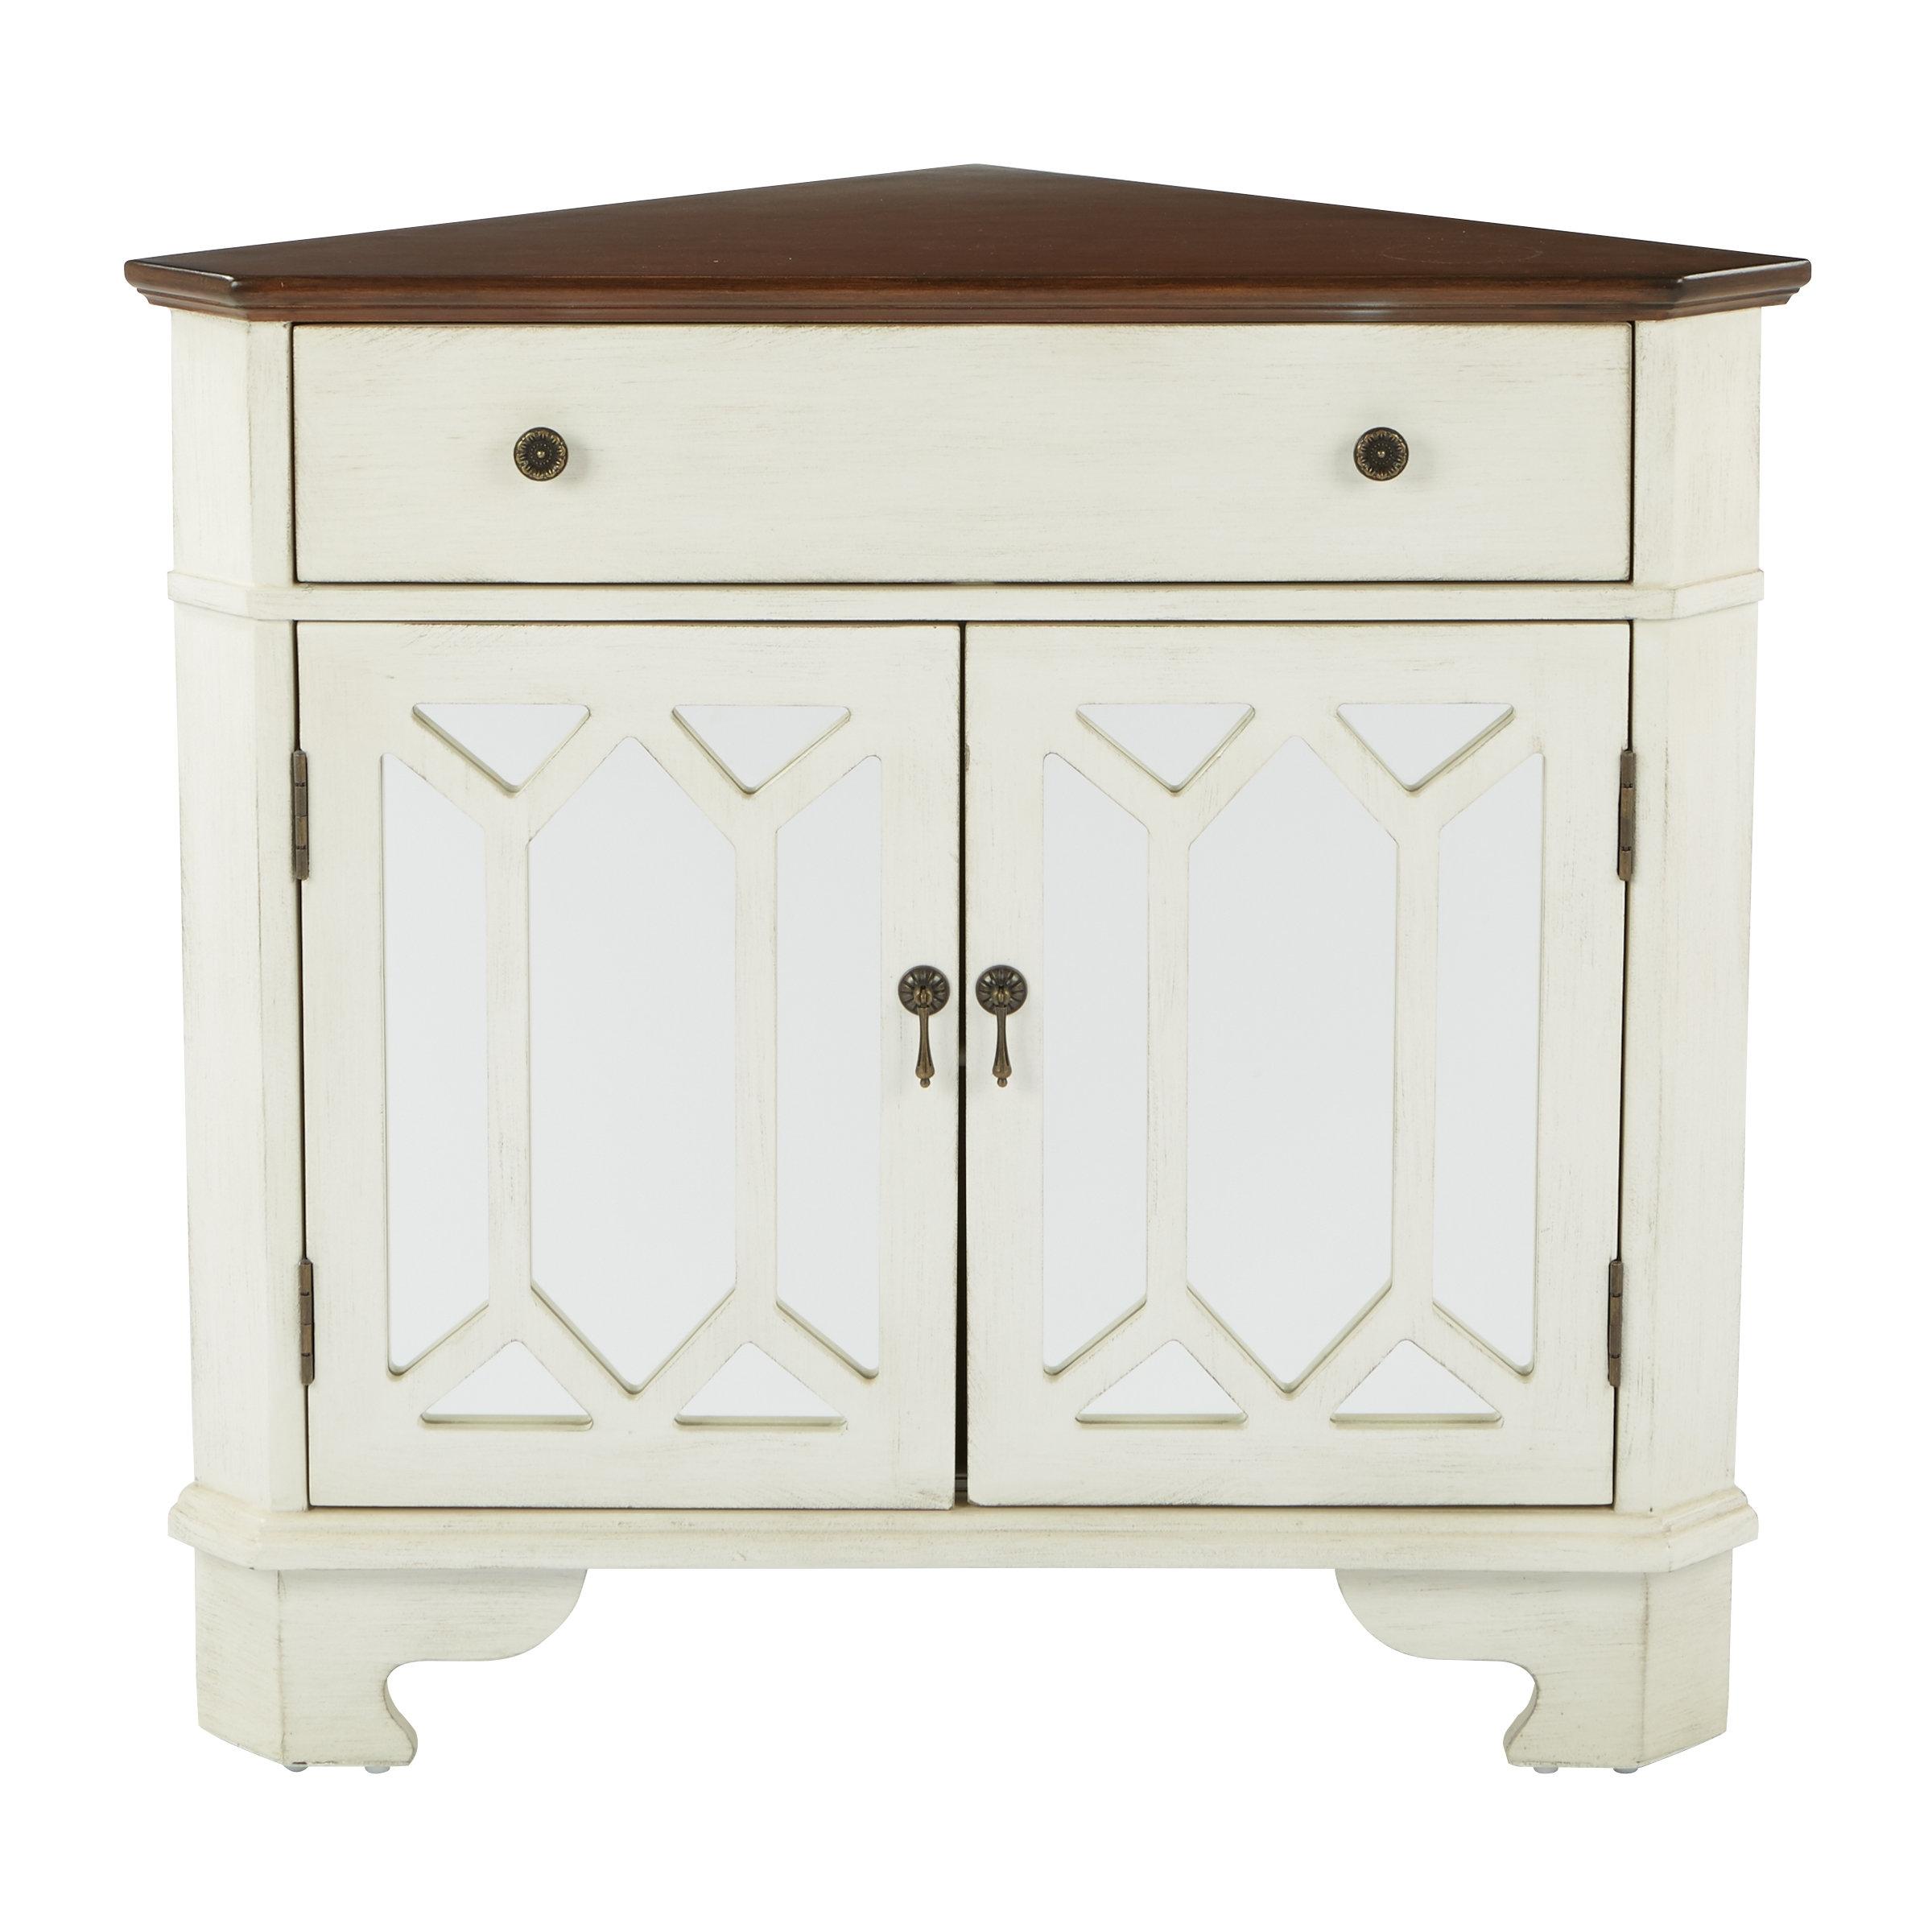 August Grove Hardyston Corner Storage 1 Drawer 2 Door Accent Cabinet with regard to Burn Tan Finish 2-Door Sideboards (Image 1 of 30)